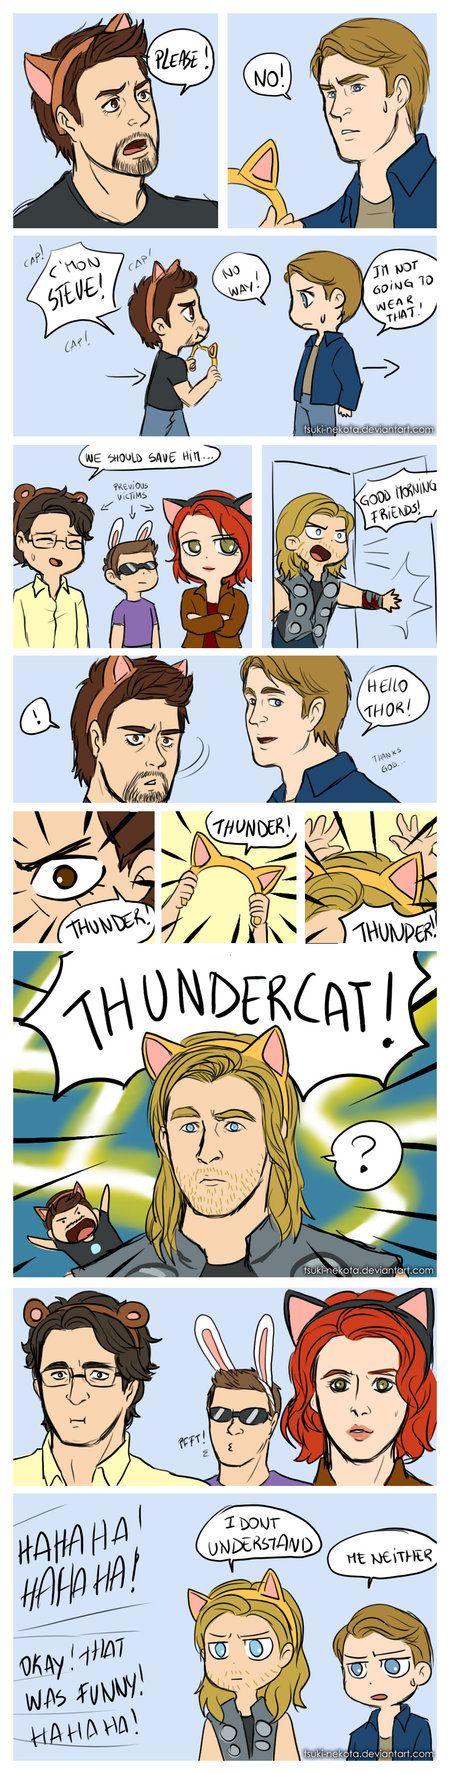 The thundercat by Tsuki-Nekota on deviantART